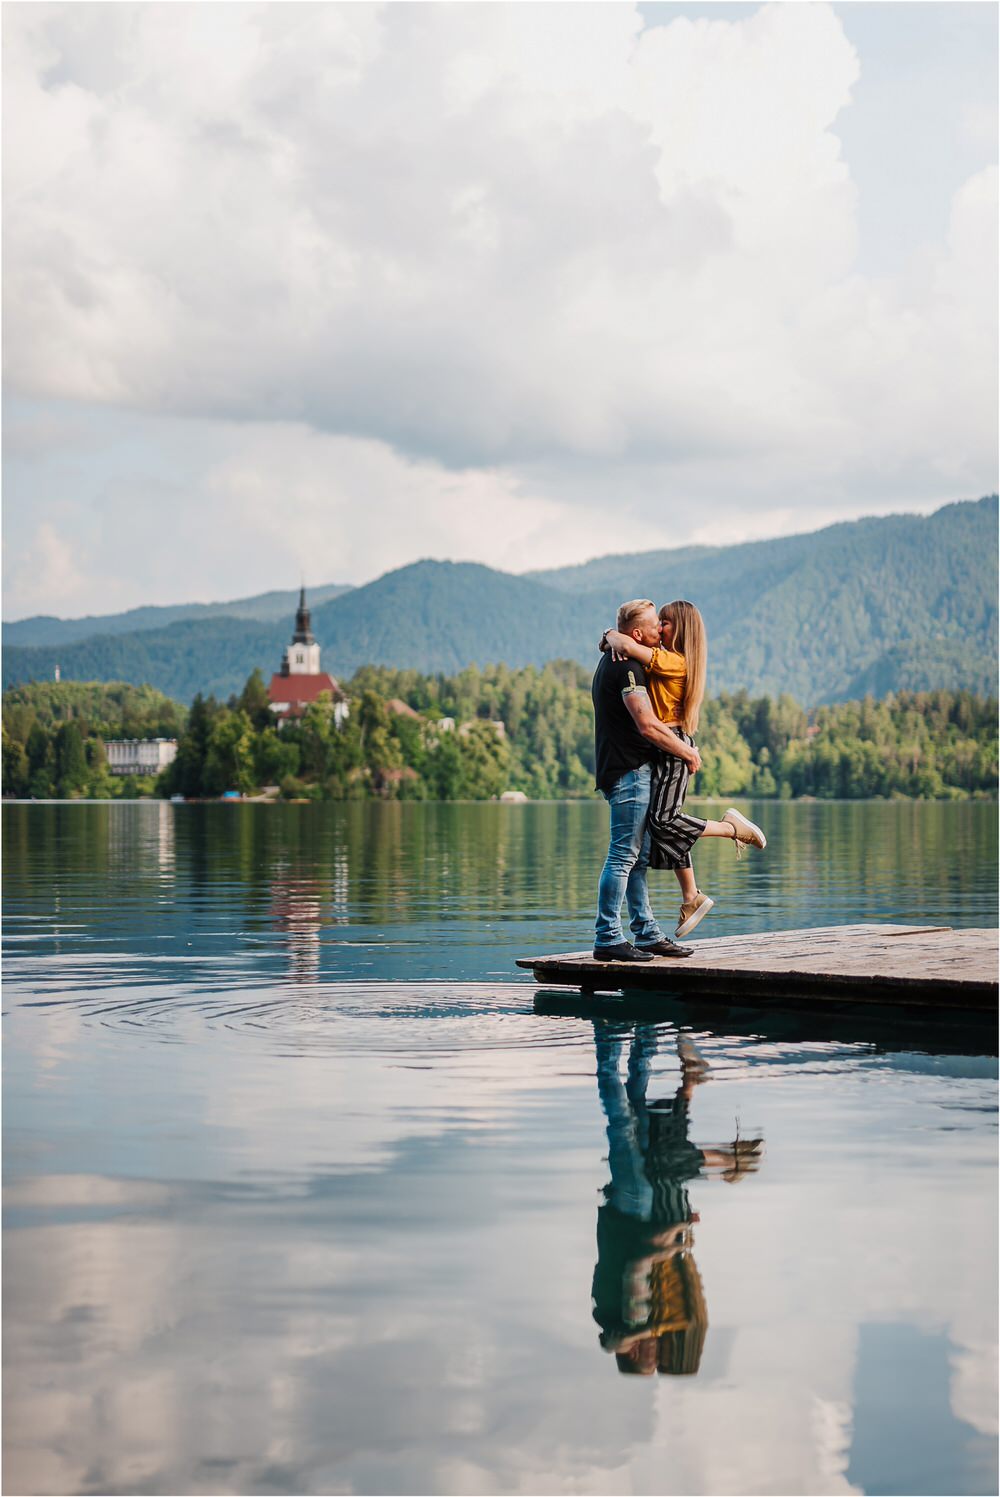 tuscany wedding photographer greece croatia dubrovnik vjencanje hochzeit wedding photography photos romantic engagement nika grega 0124.jpg